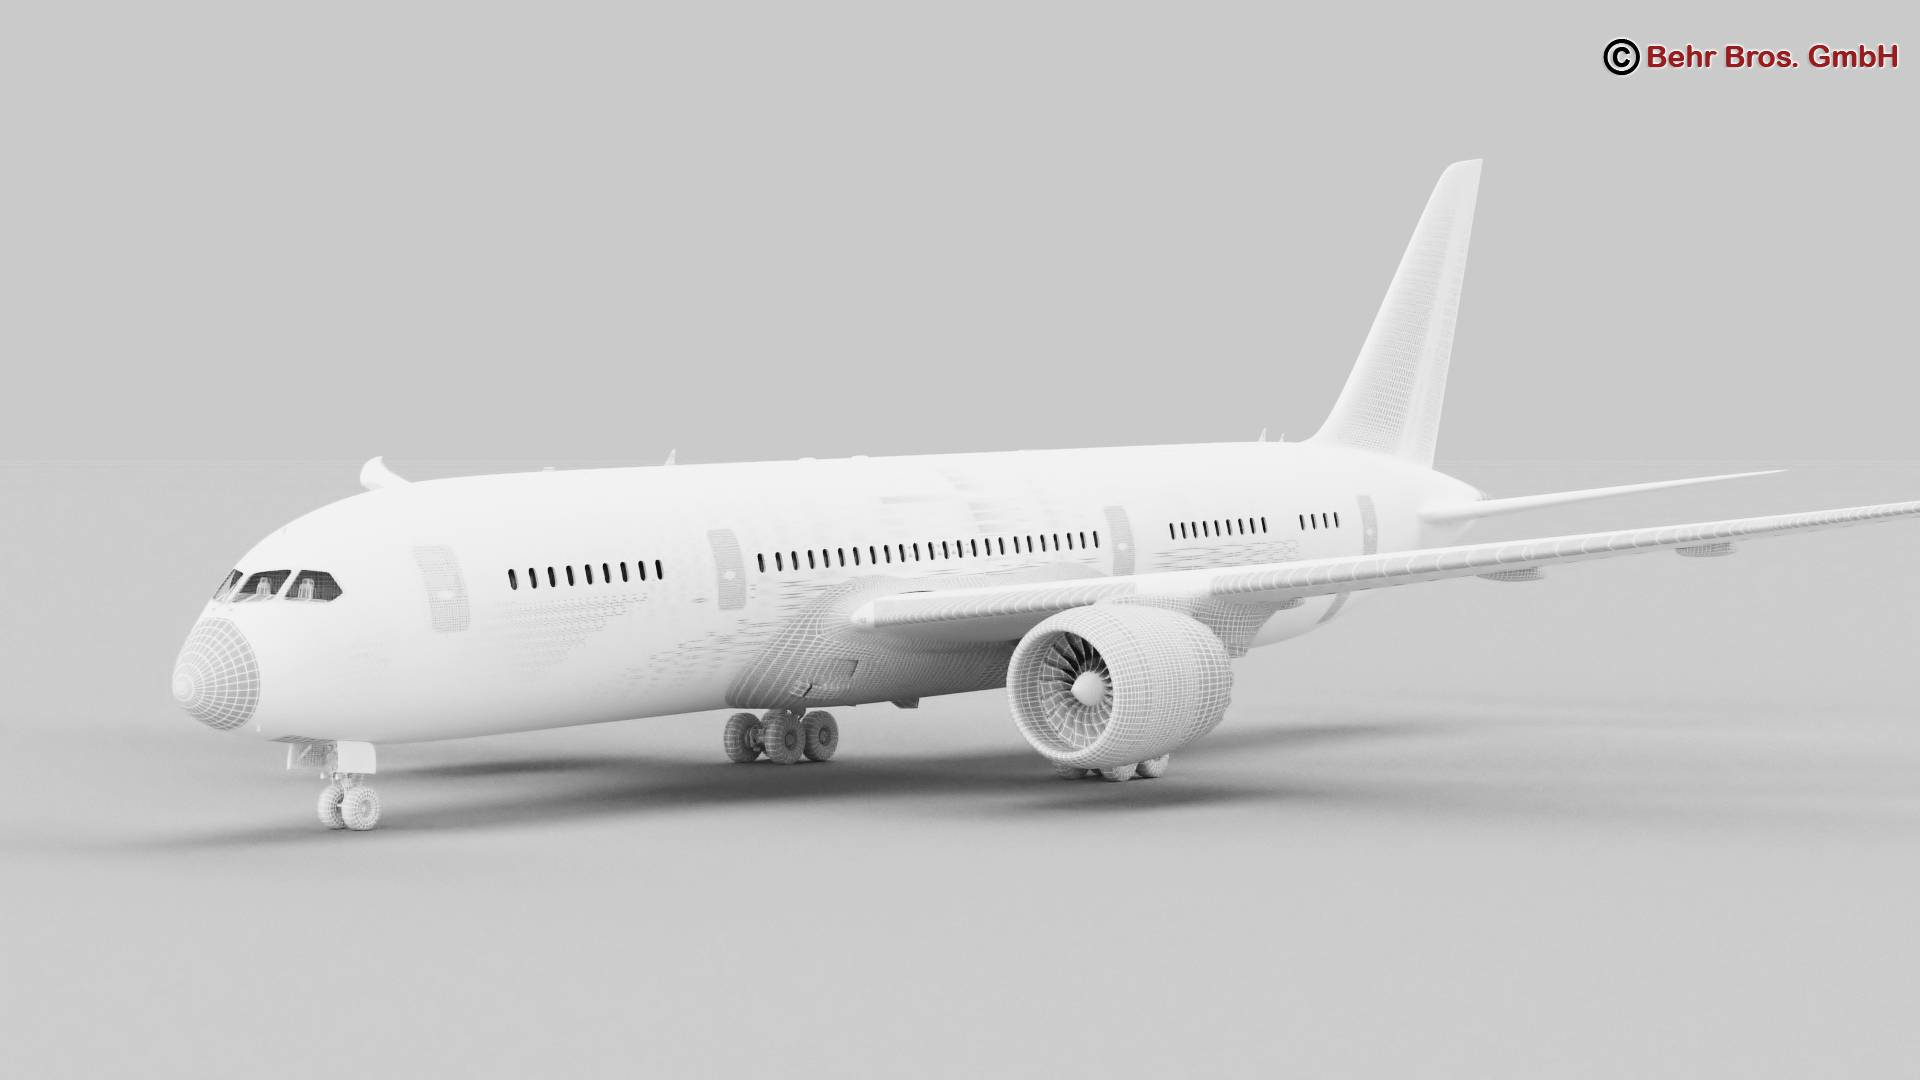 Boeing 787-8 3d gerð 3ds max fbx c4d lwo ma mb obj 251372